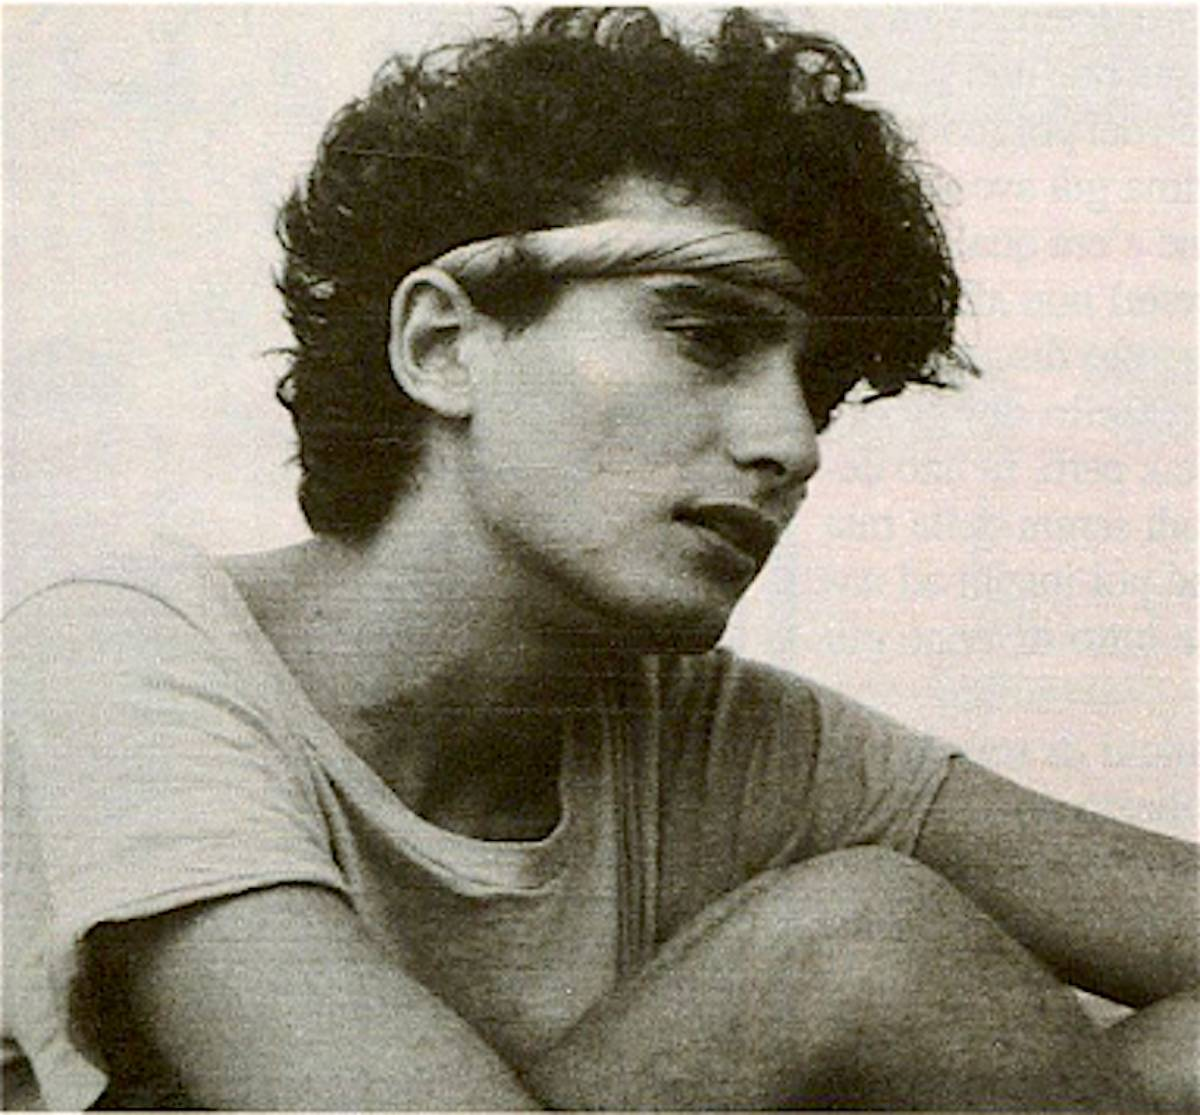 Vladimir Luxuria da giovane